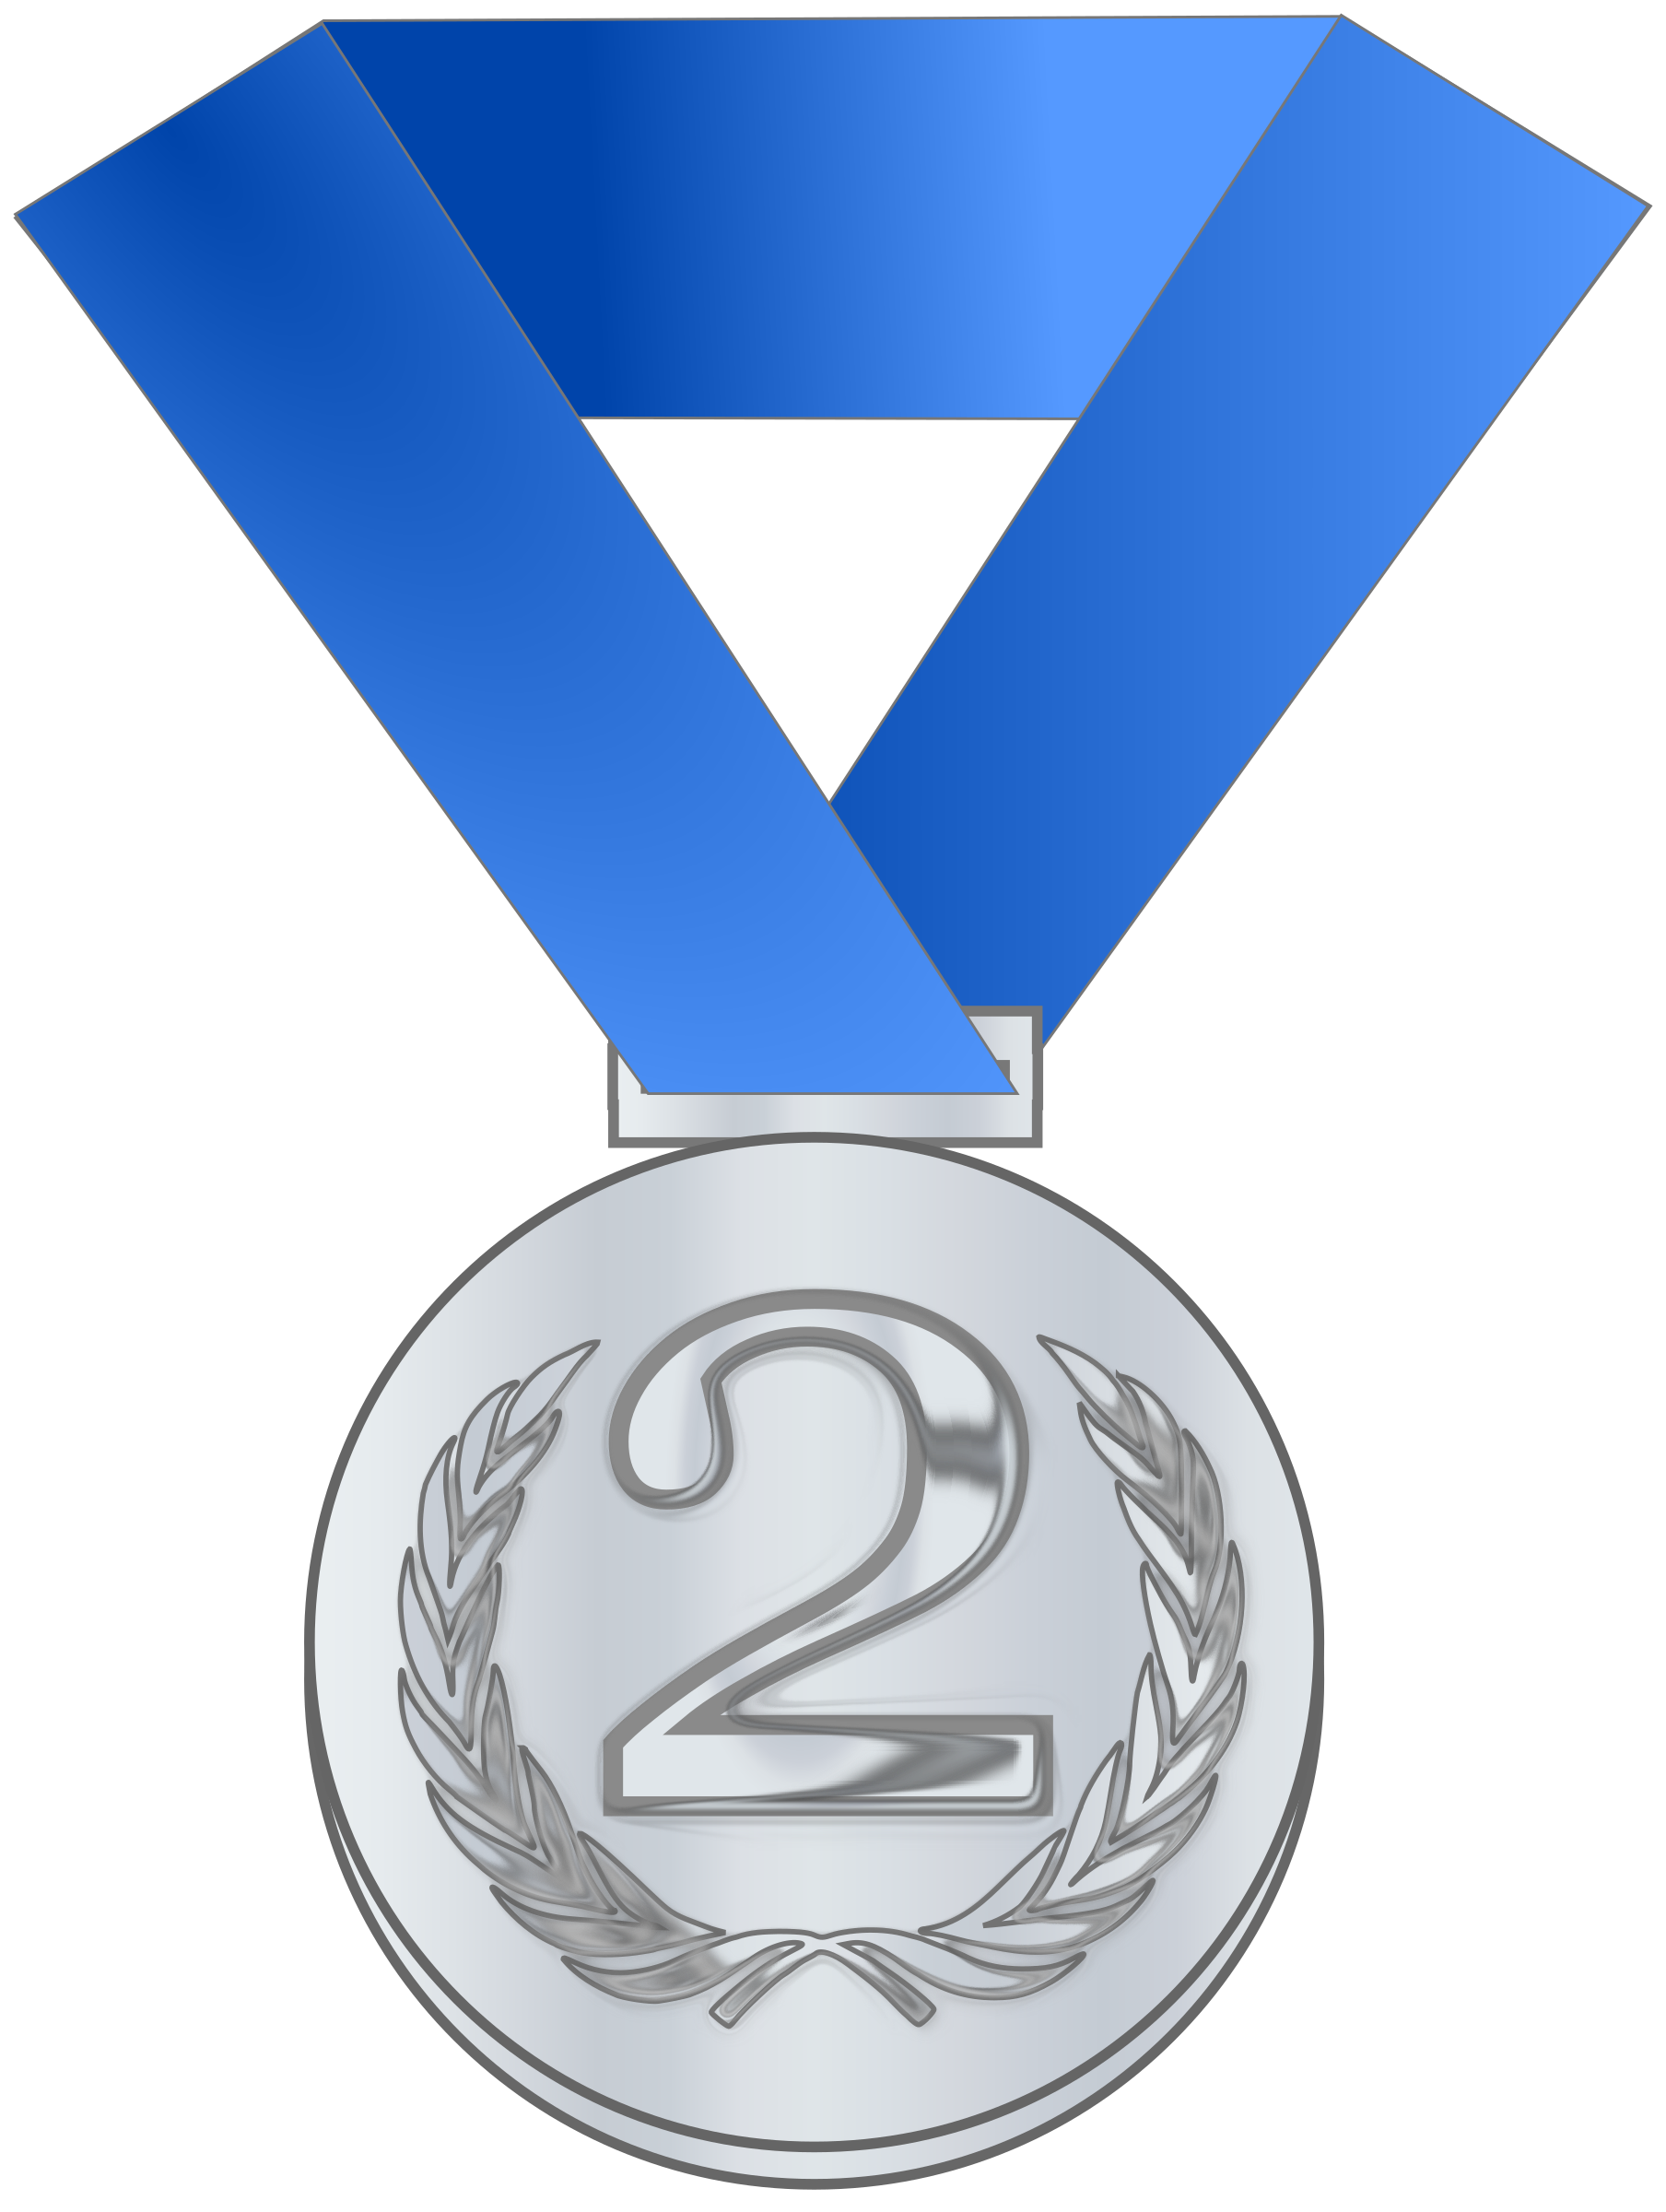 clip free Medal clipart silver. Award big image png.